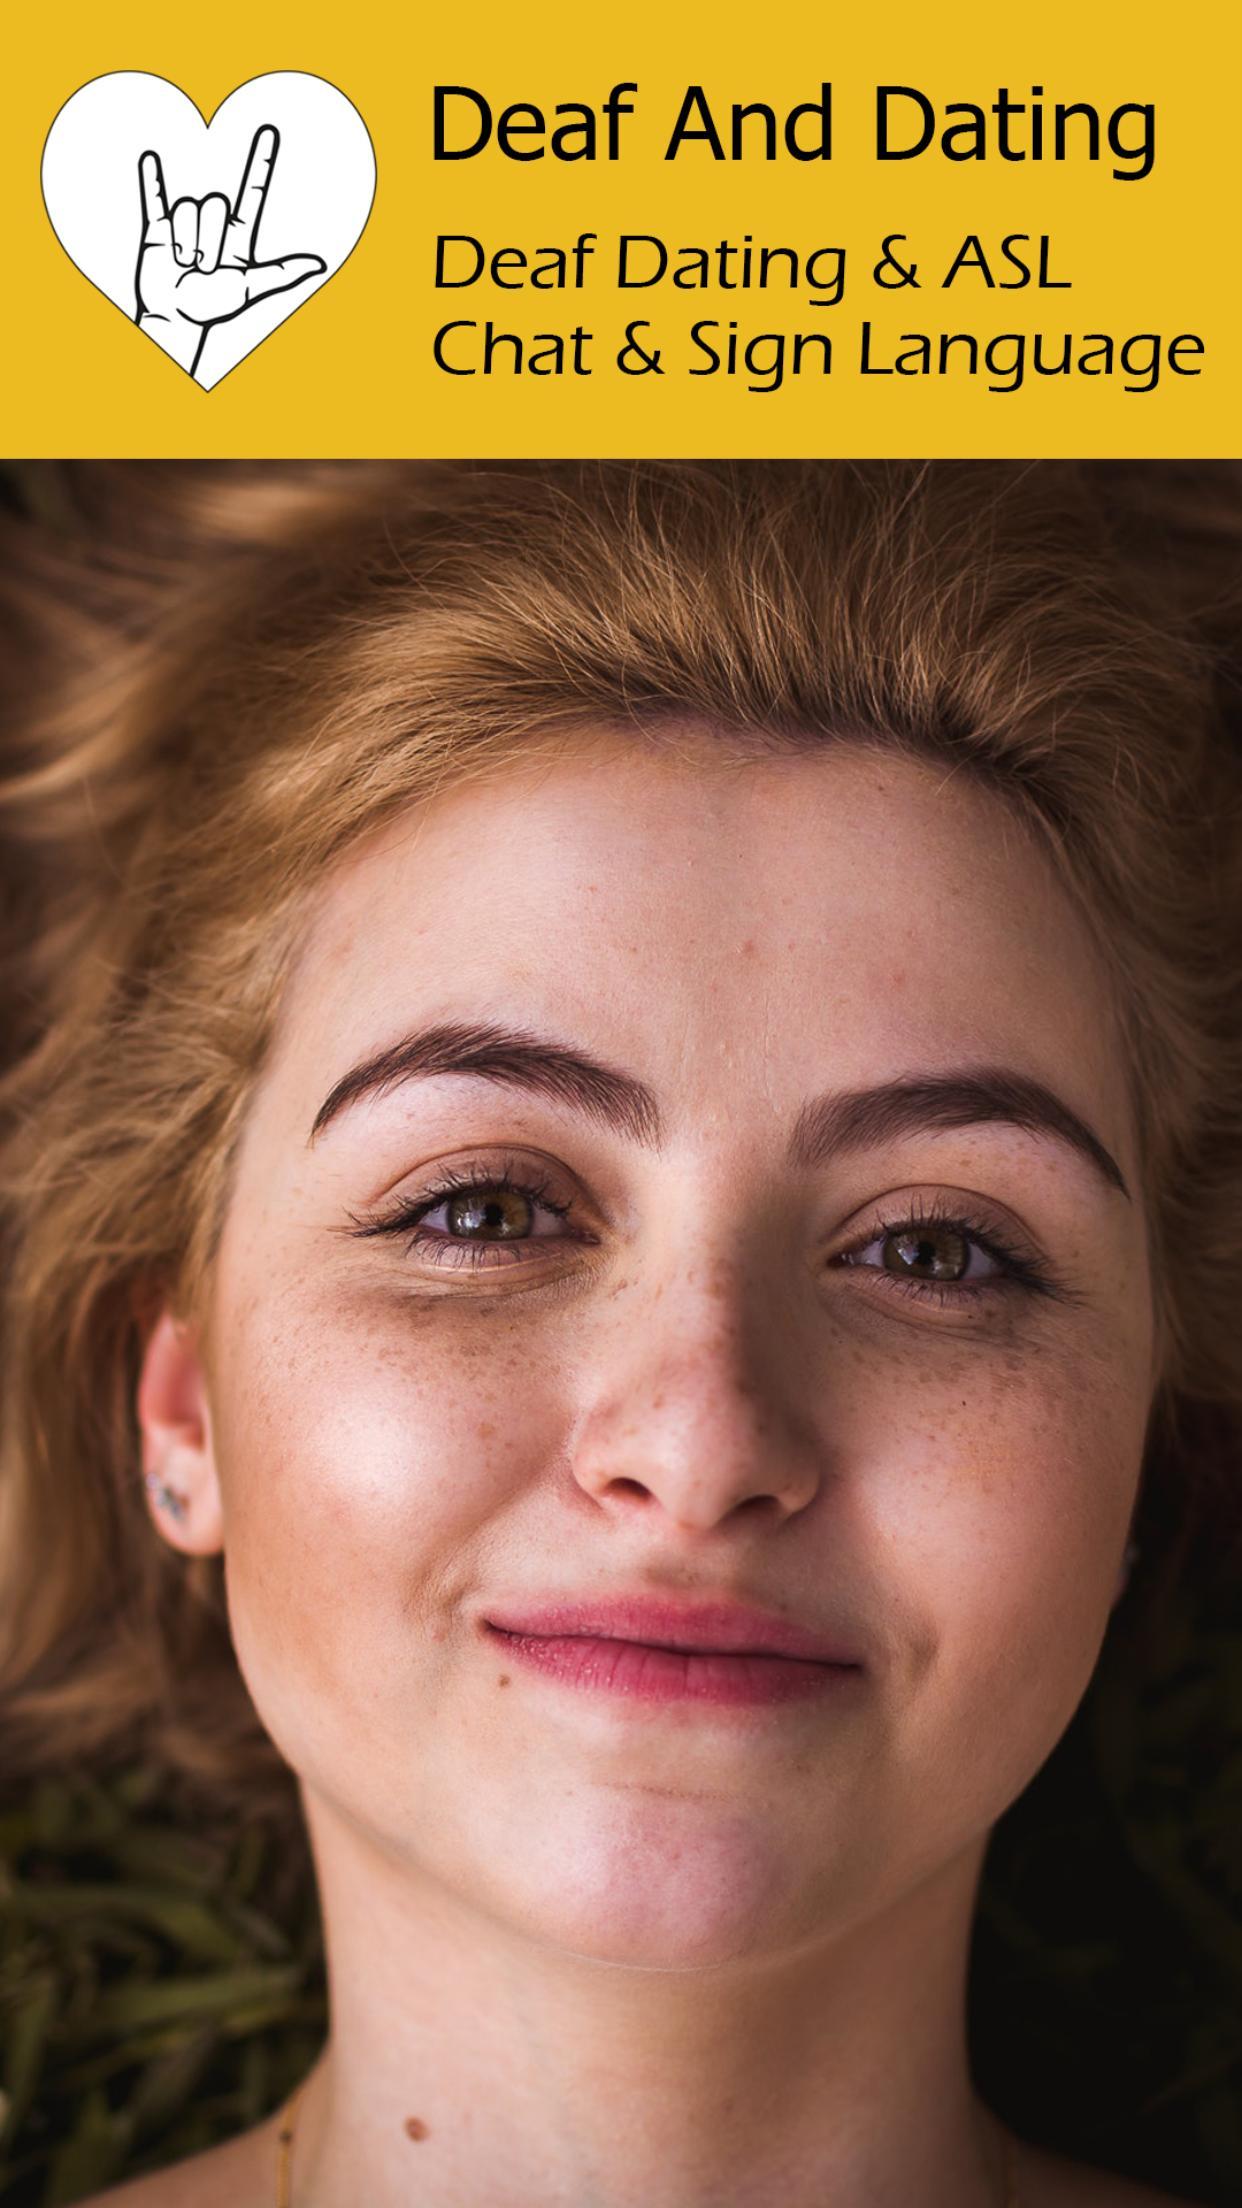 Deafs dating sites noel jones and lisa raye dating